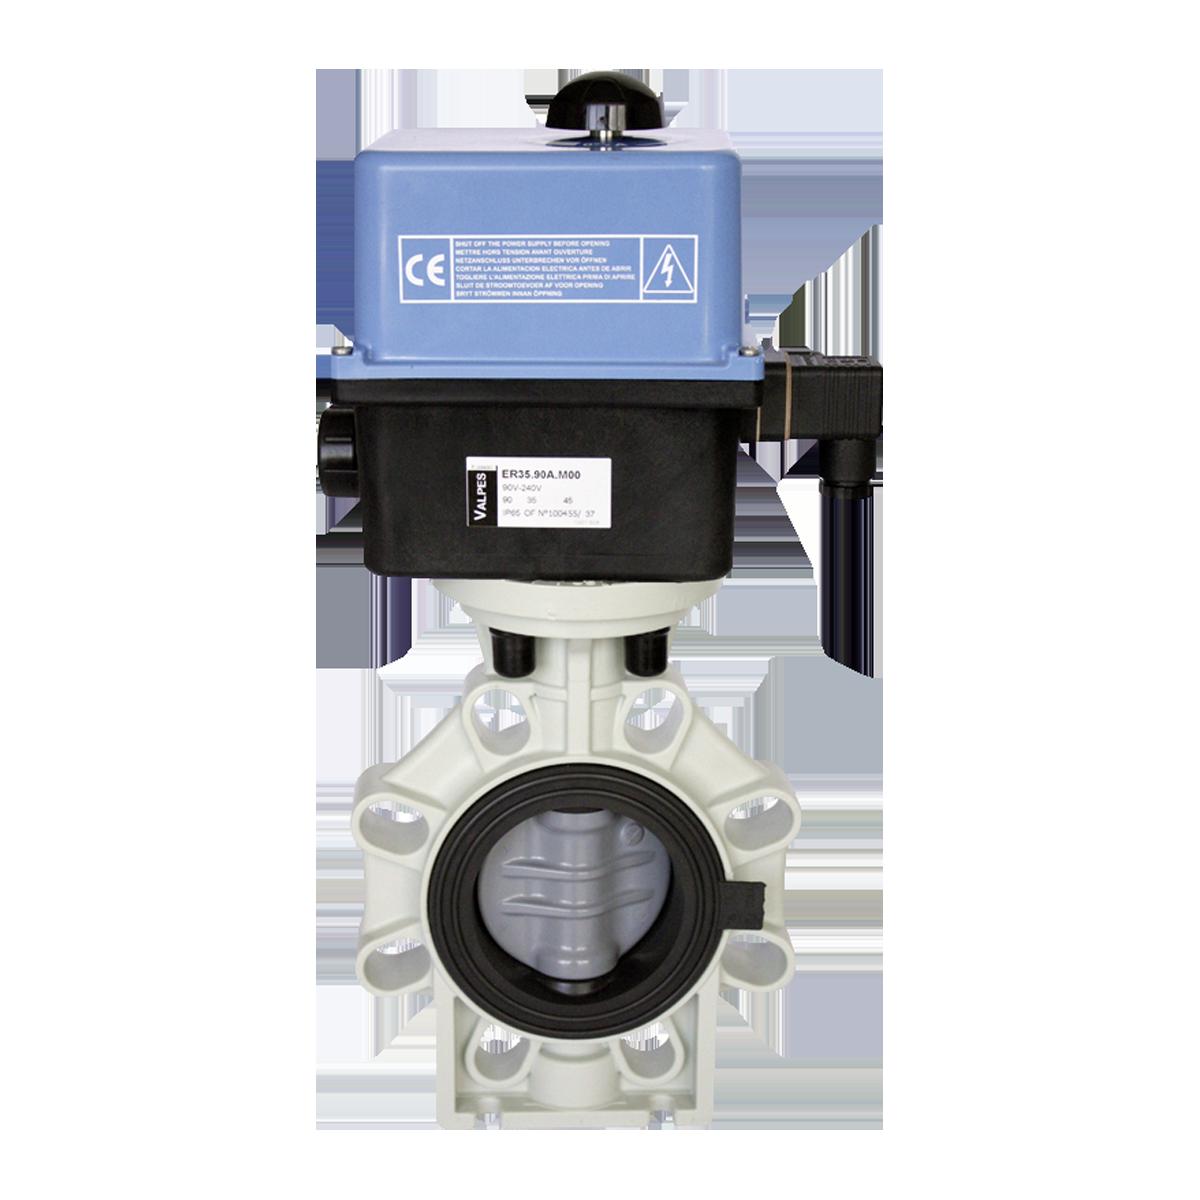 Praher butterfly valve K4 PVC-C with Valpes actuator, grey, black, blue, white